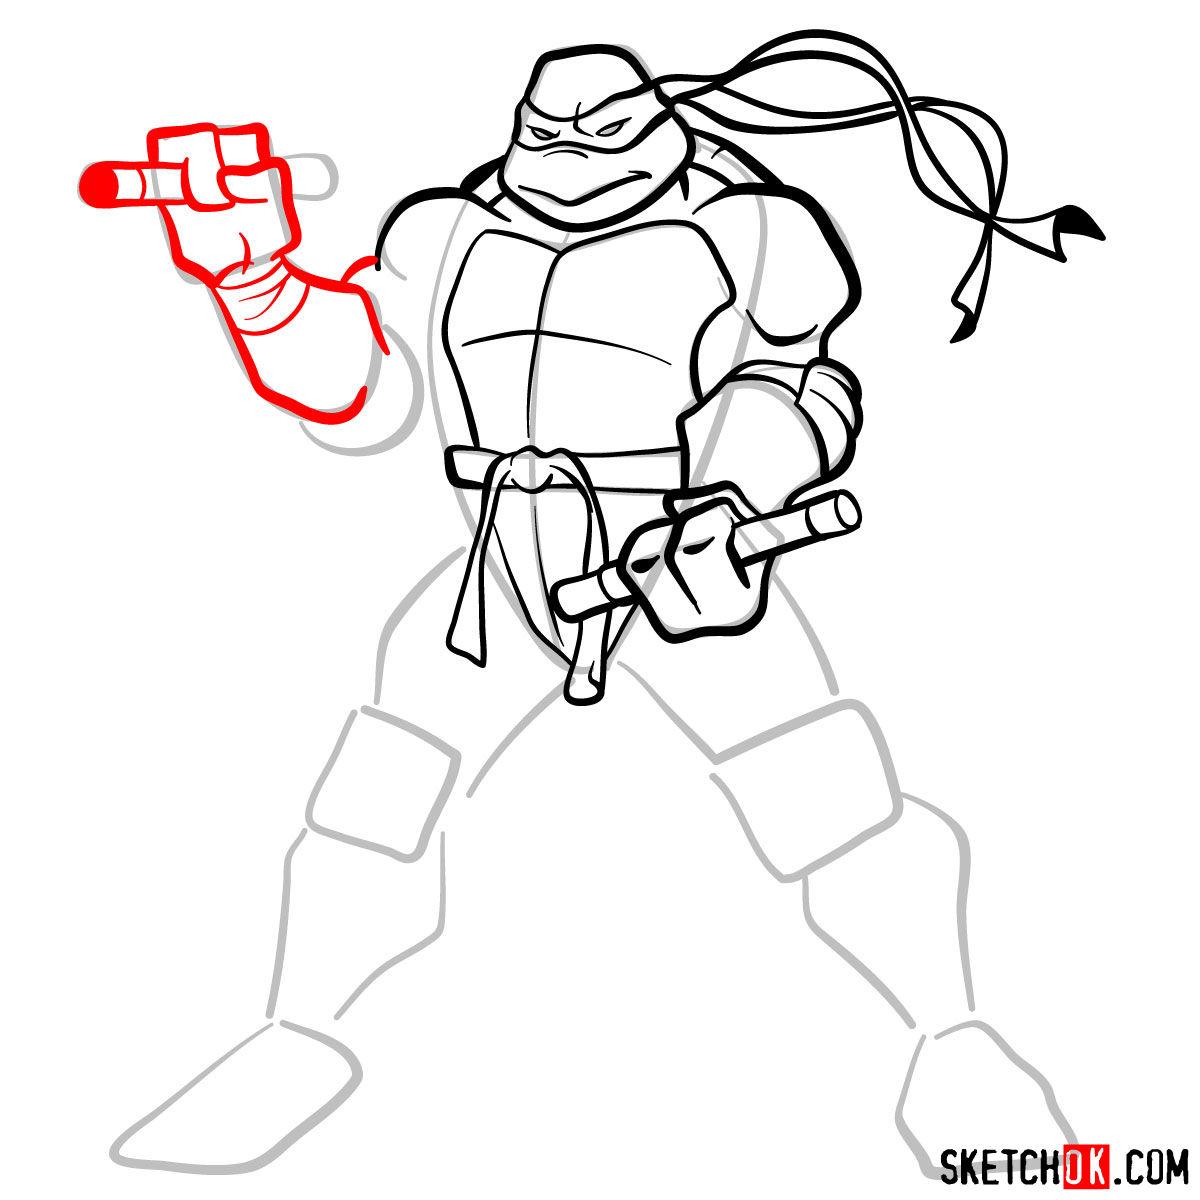 How to draw Michaelangelo ninja turtle - step 09